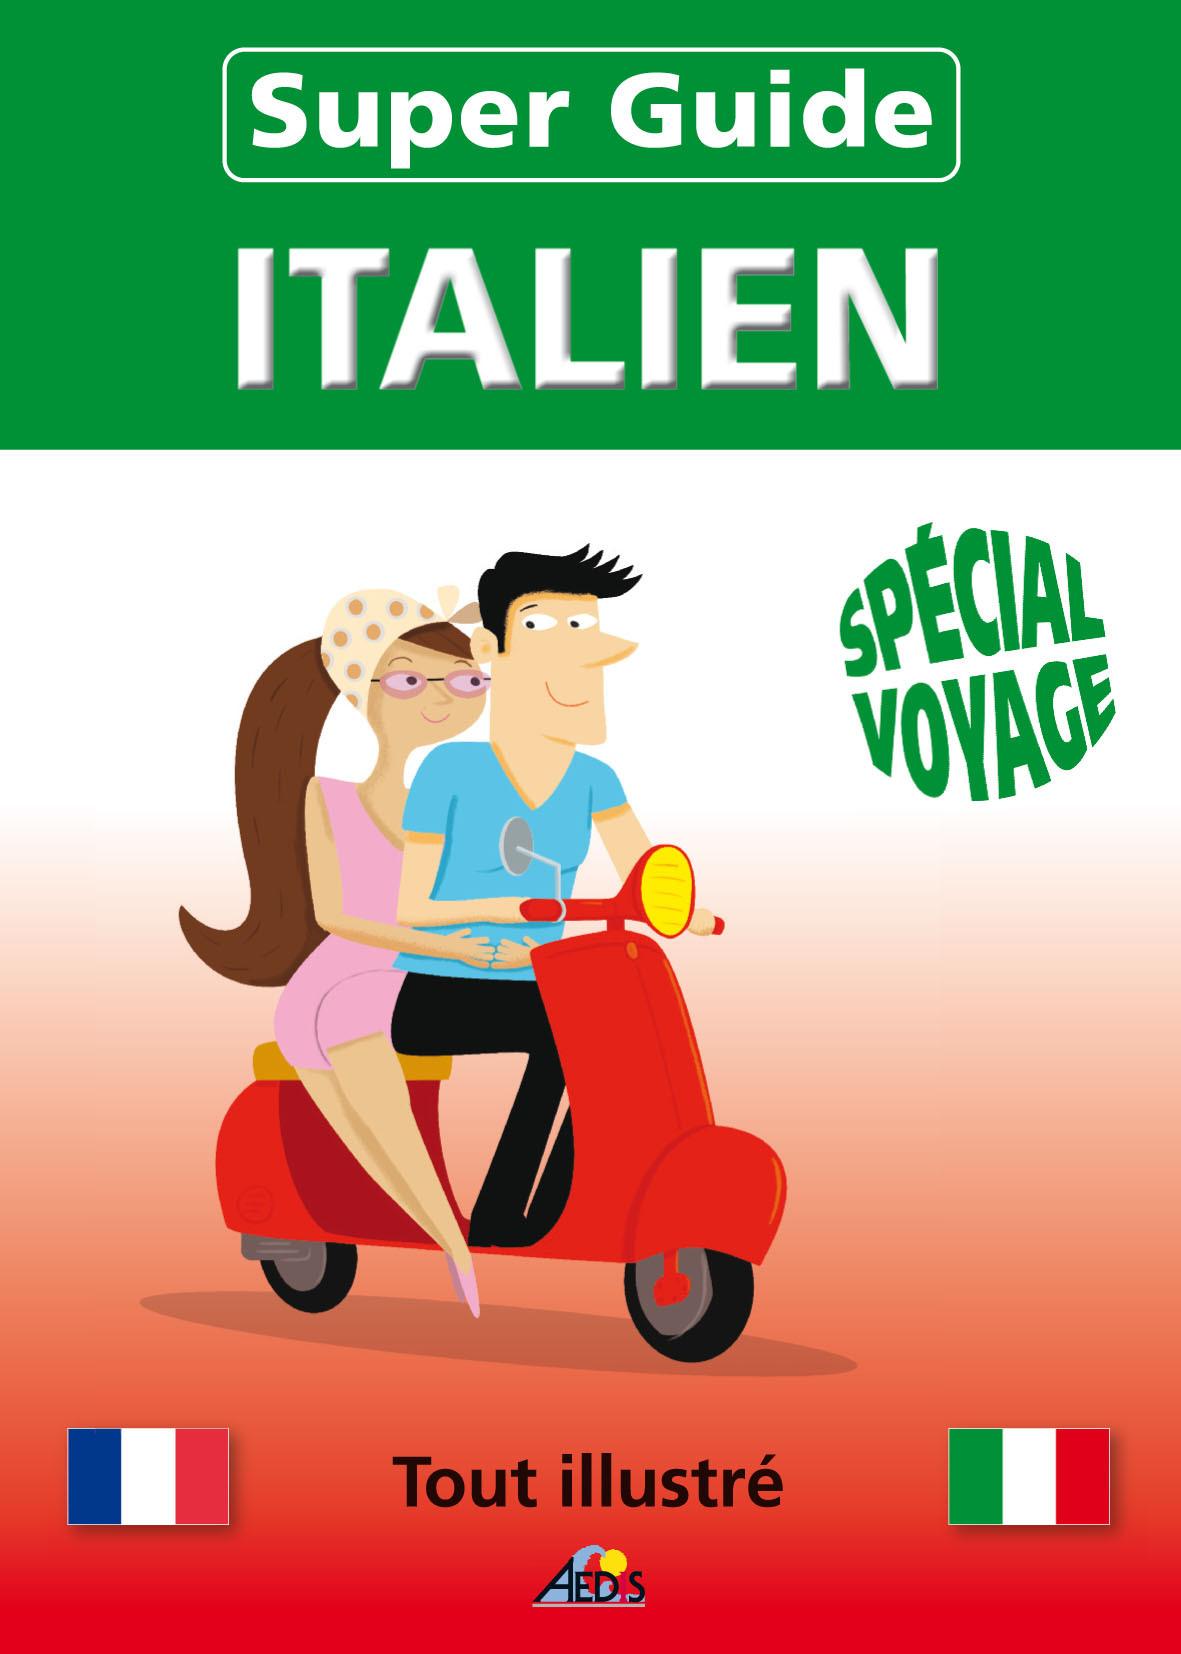 SUPER GUIDE ITALIEN - SPECIAL VOYAGE